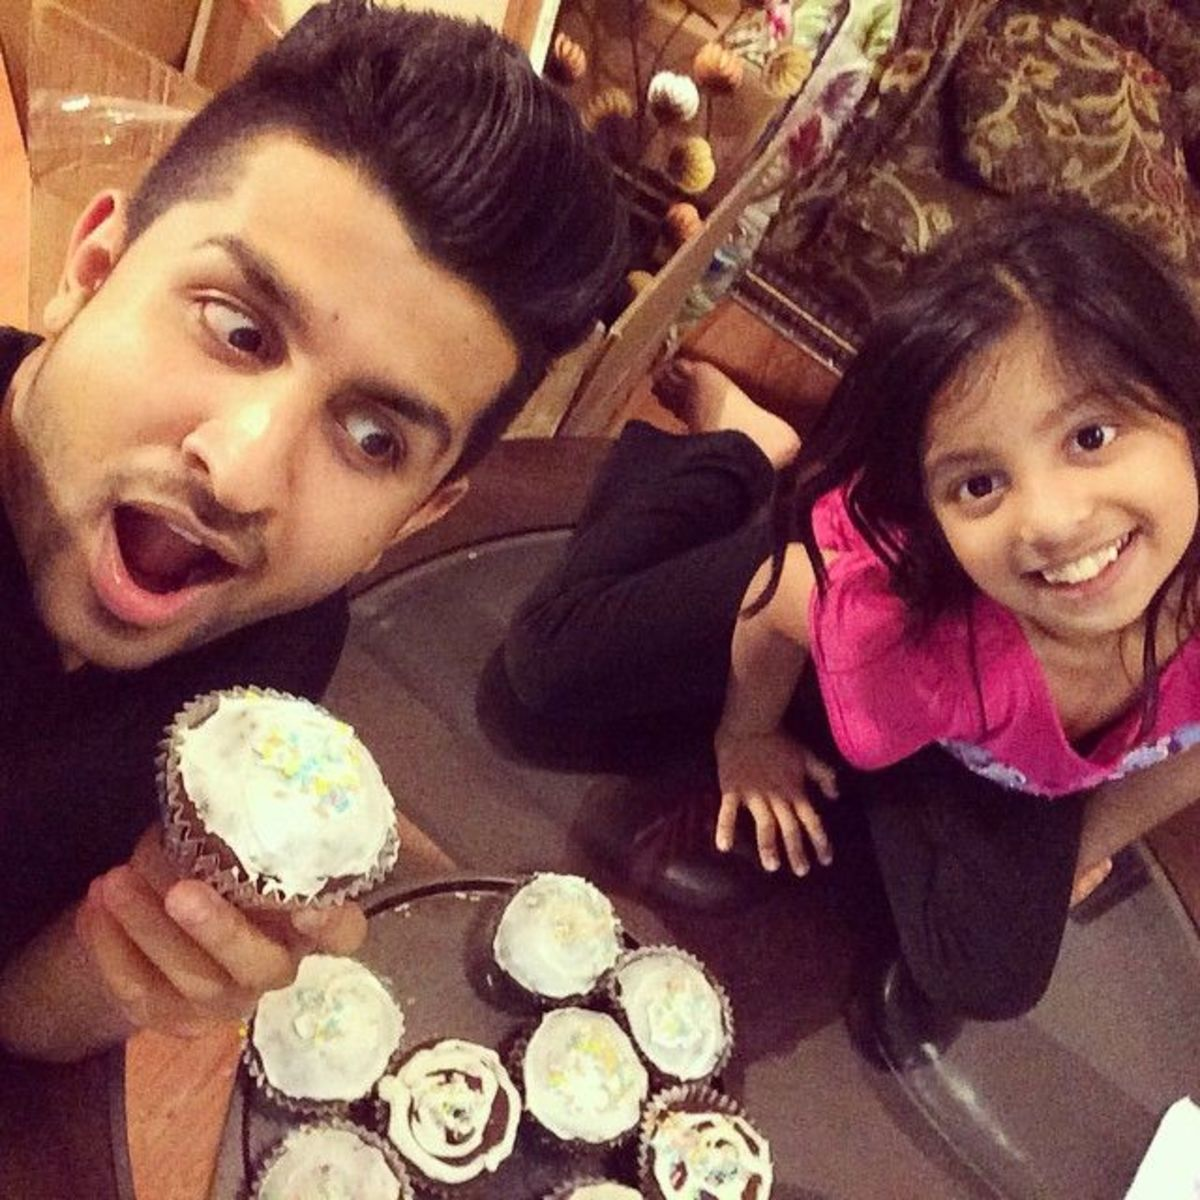 Shehryaar with his sister Maha.